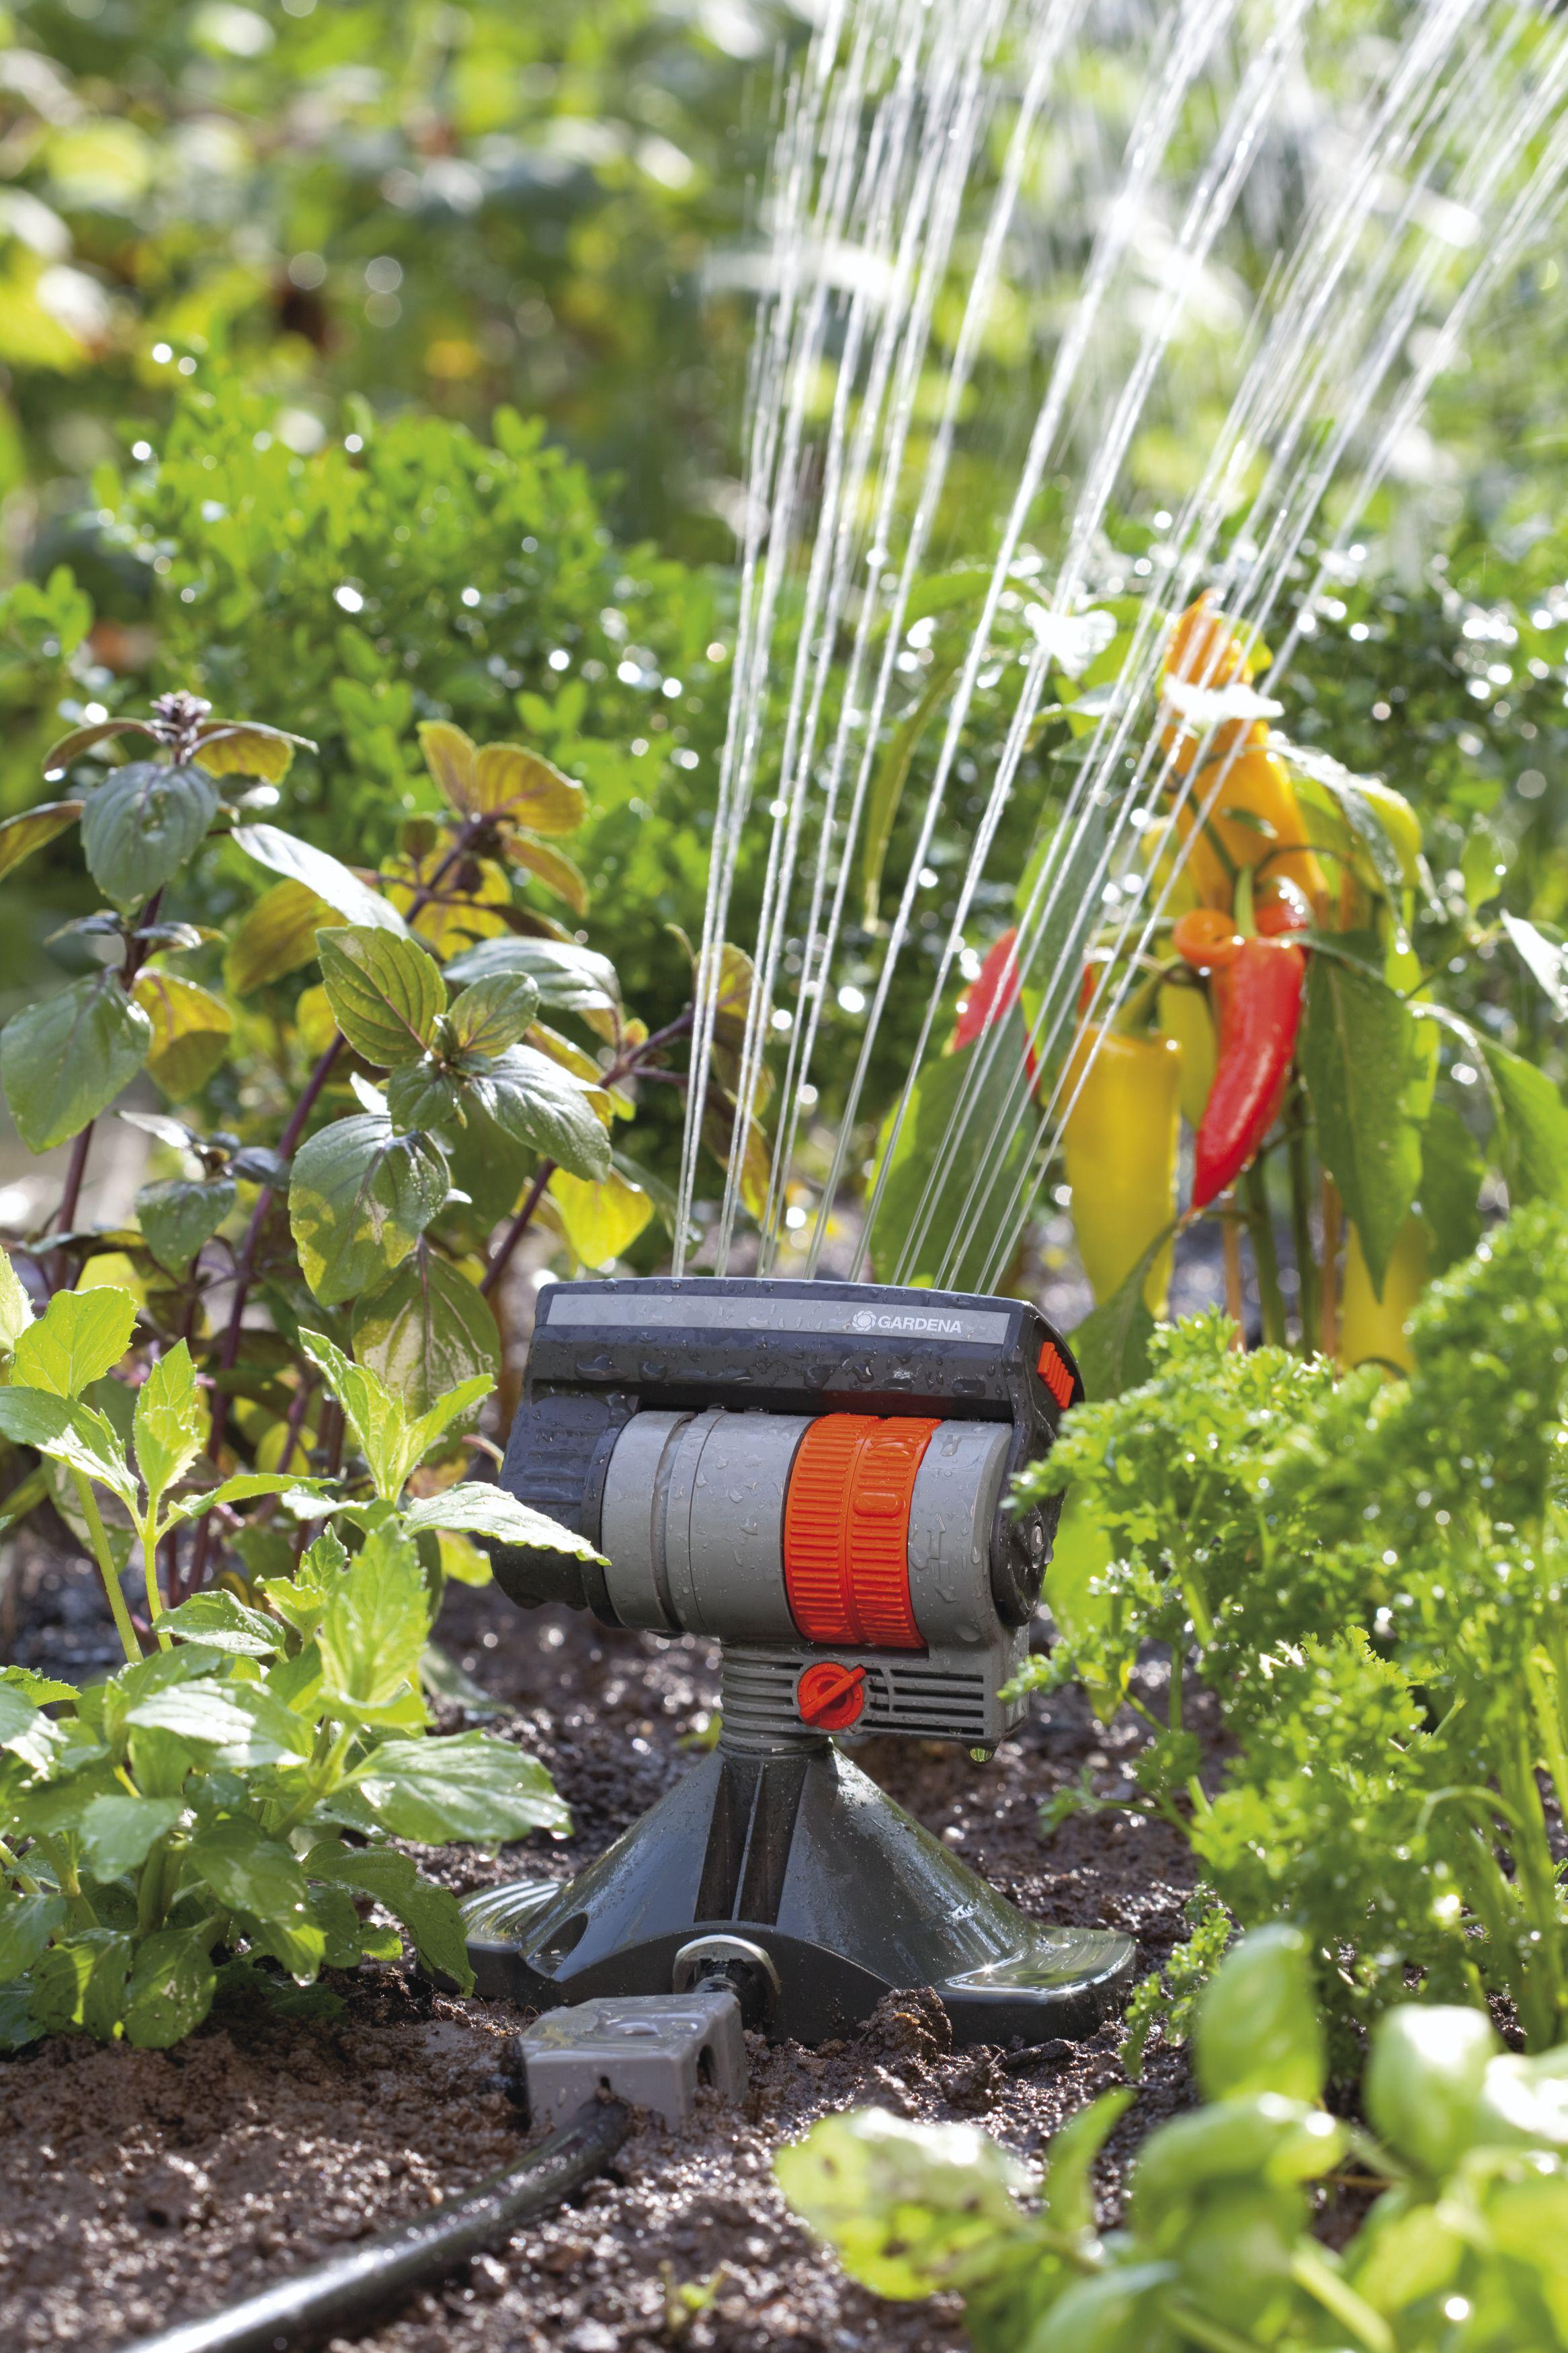 Gardena Oscillating Sprinkler Os 90 8361